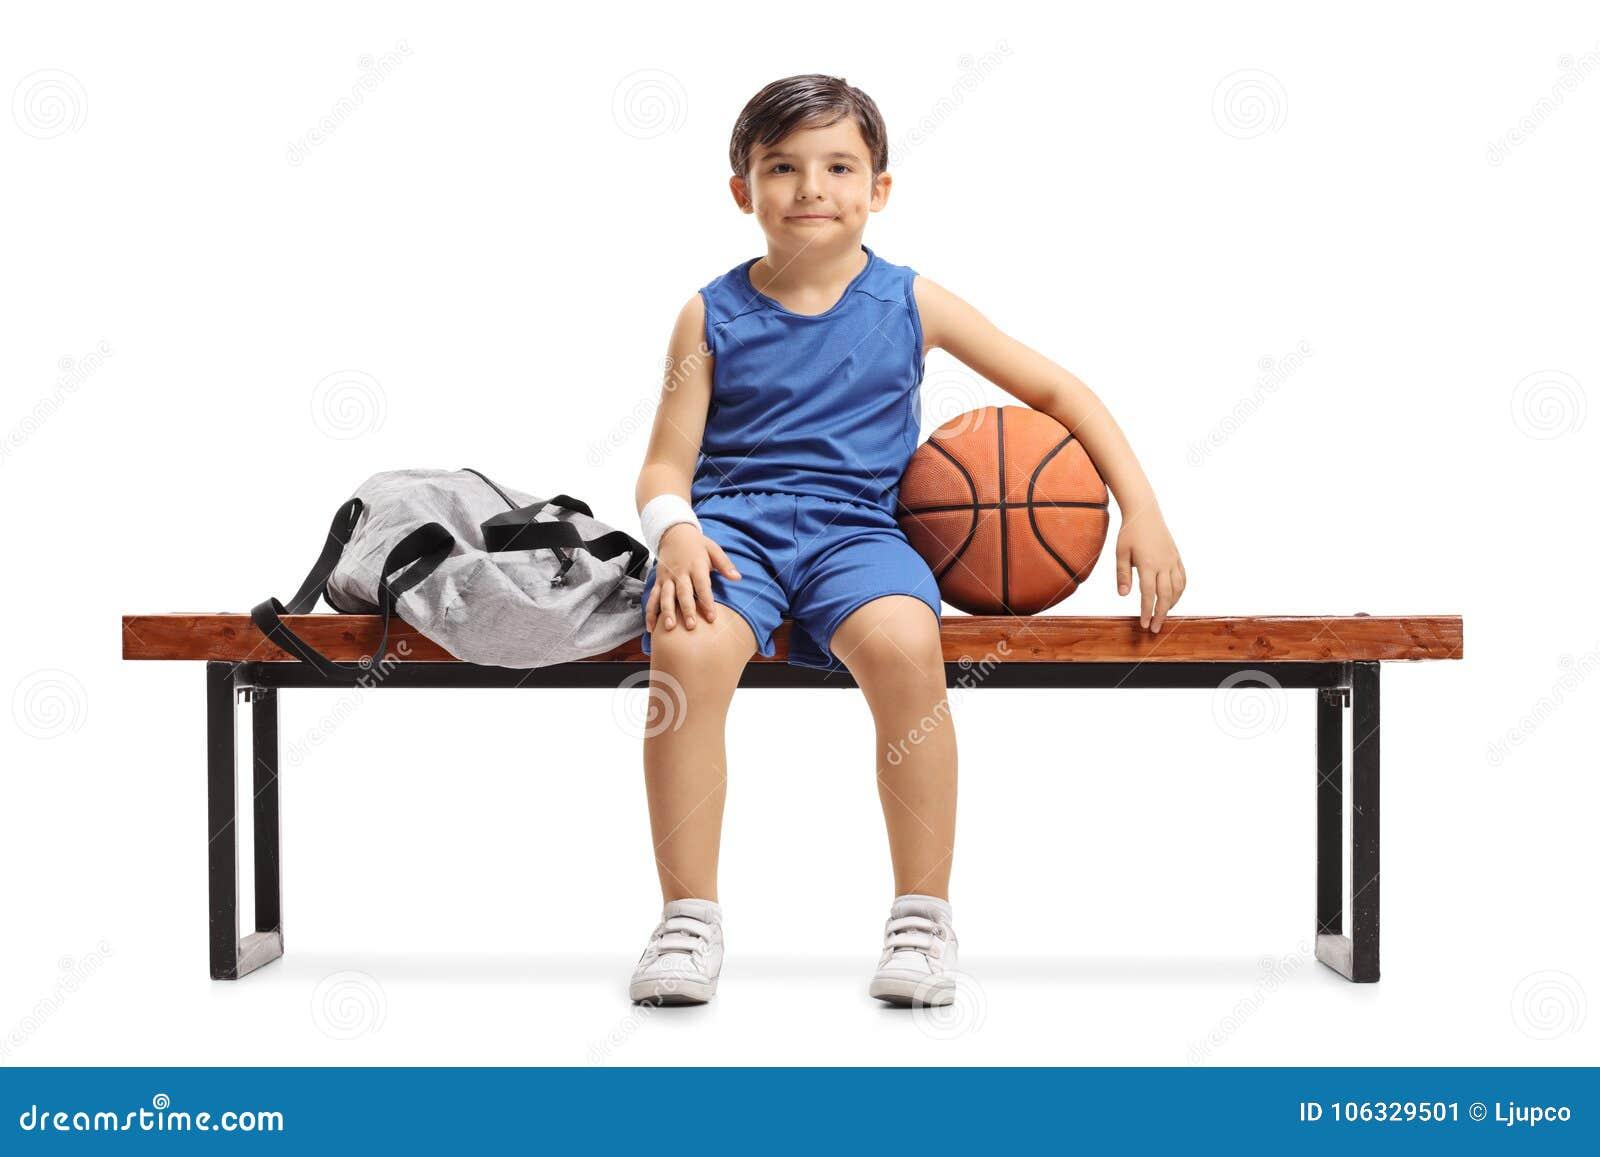 Awe Inspiring Little Basketball Player Sitting On A Wooden Bench Next To A Beatyapartments Chair Design Images Beatyapartmentscom